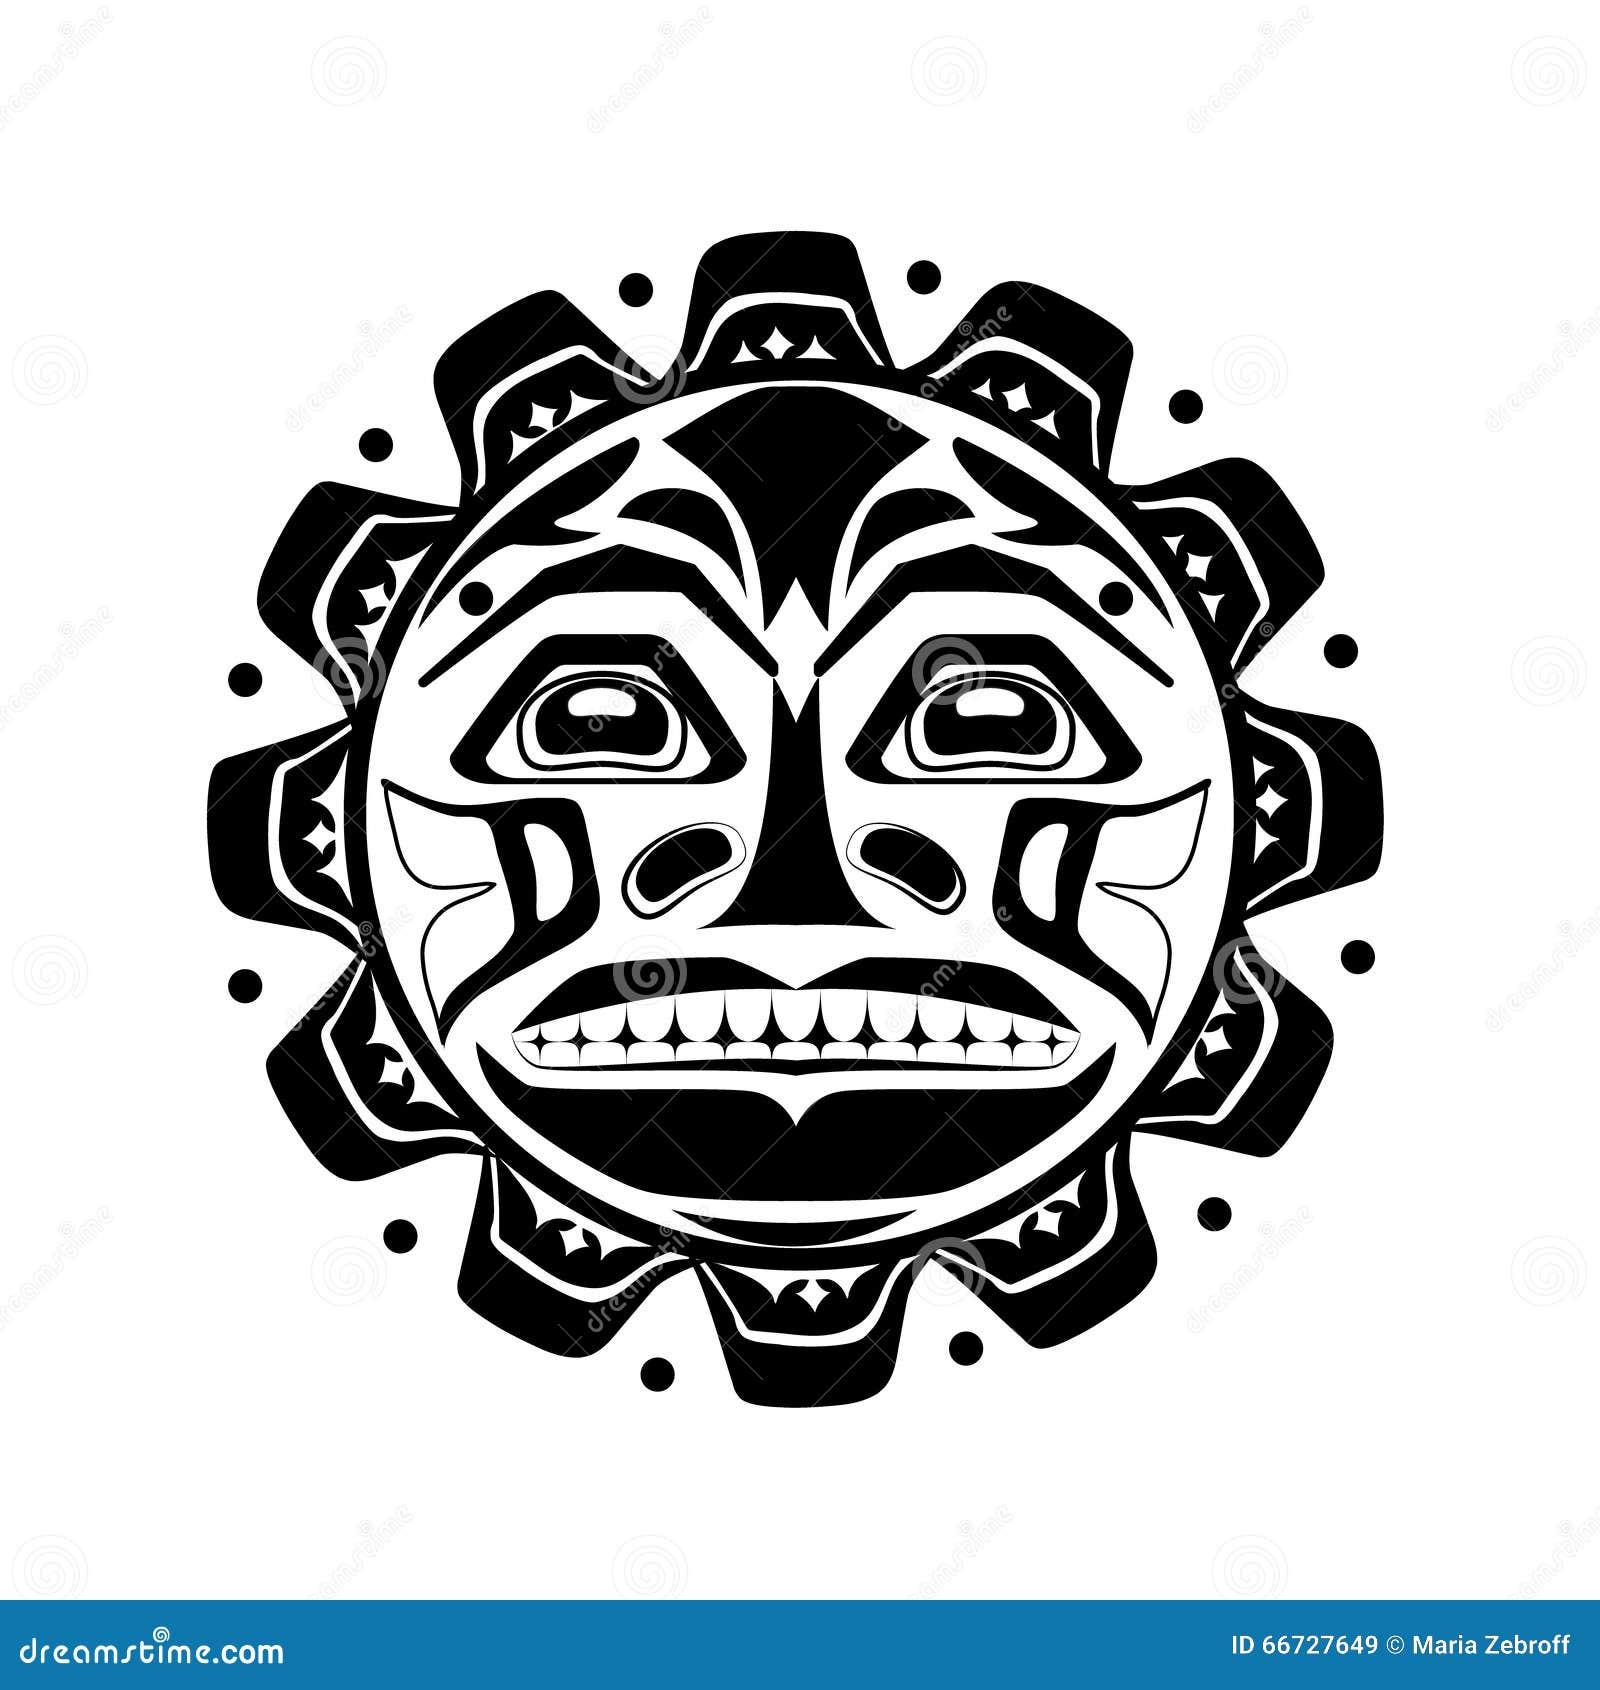 Line Drawing Sun Vector : Vector illustration of the sun symbol stock image